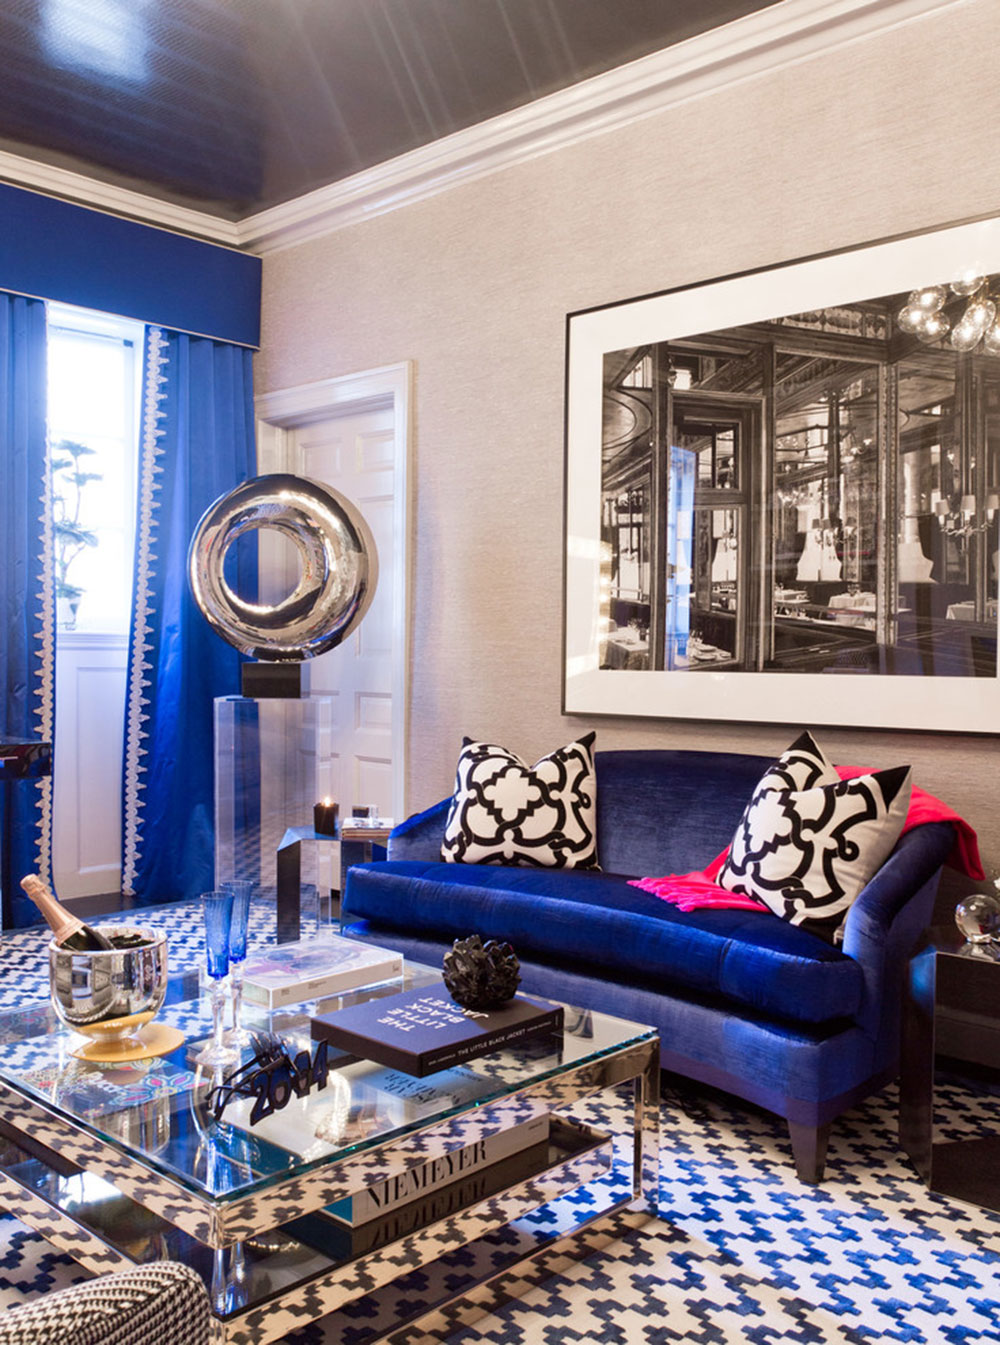 Genial Blue Living Room Designs Blue Living Room Furniture Blue Living Room Sets Blue Living Latest Trends Latest Trends houzz 01 Blue Living Room